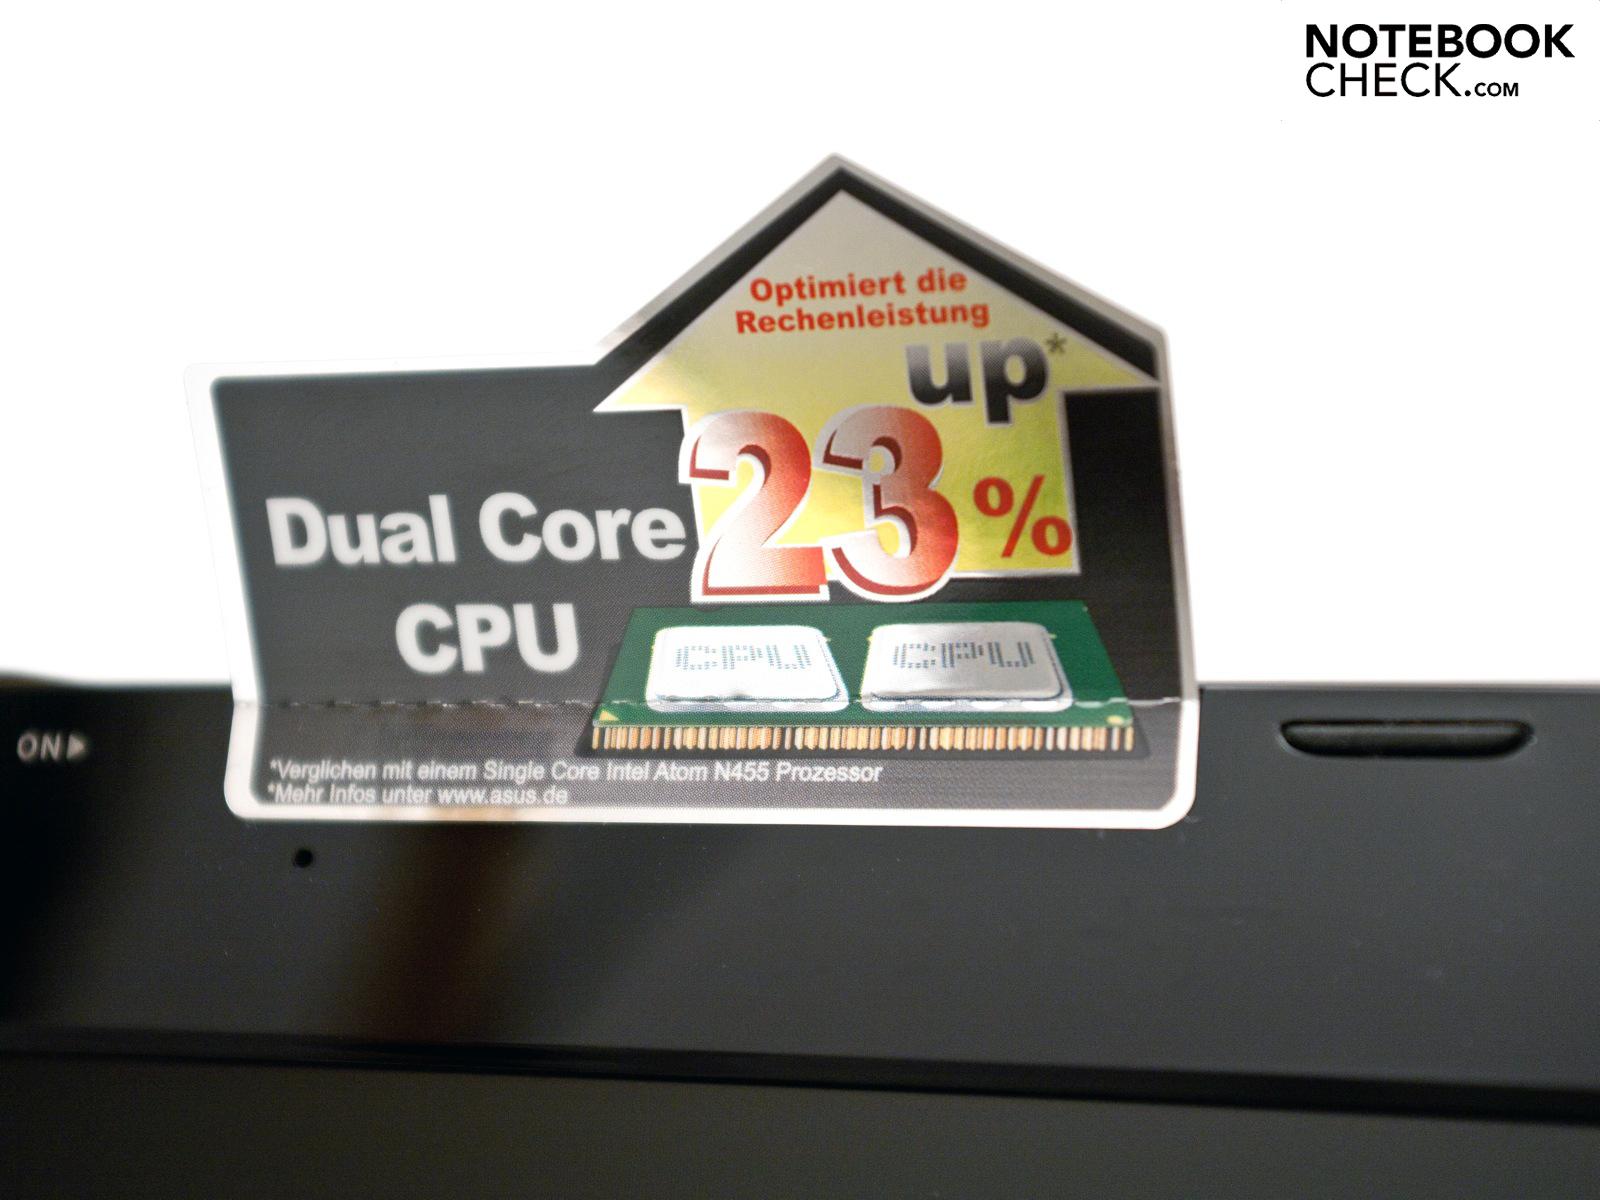 Review Asus Eee PC 1015PN Netbook